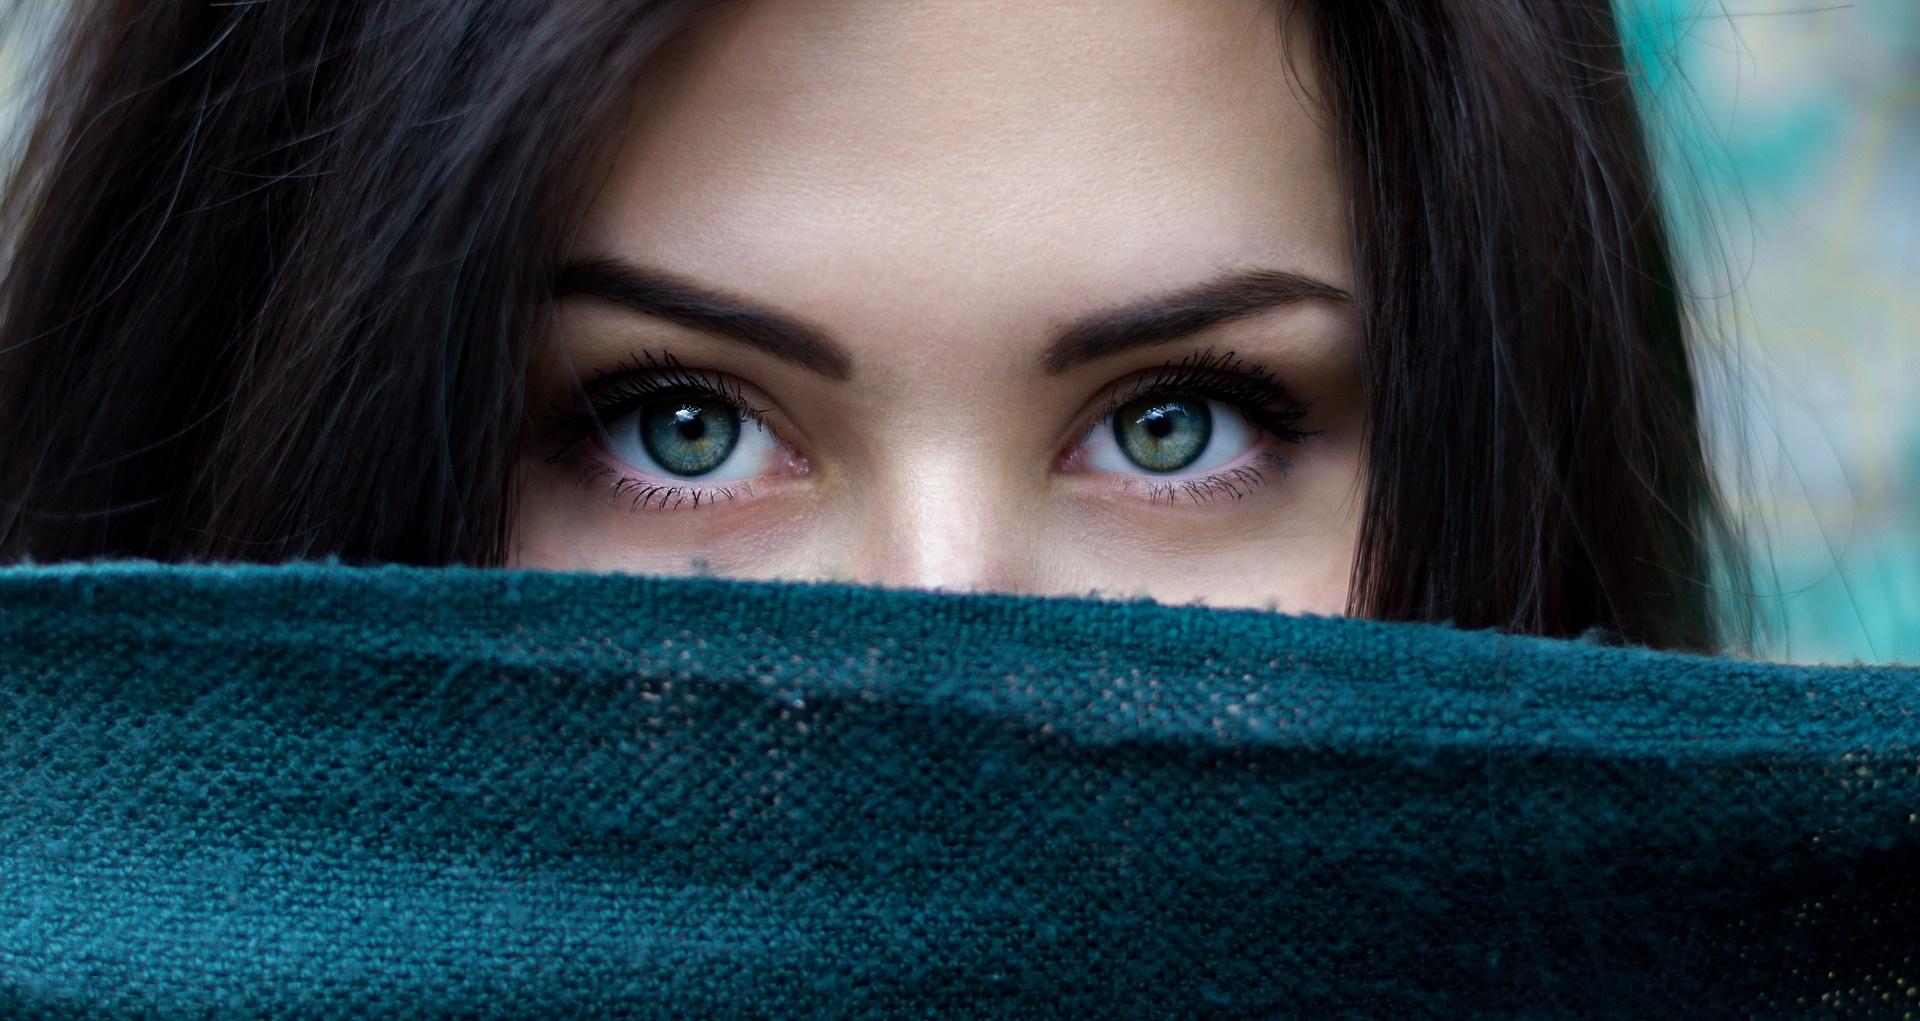 Eyebrow and eyelash colouring and treatments